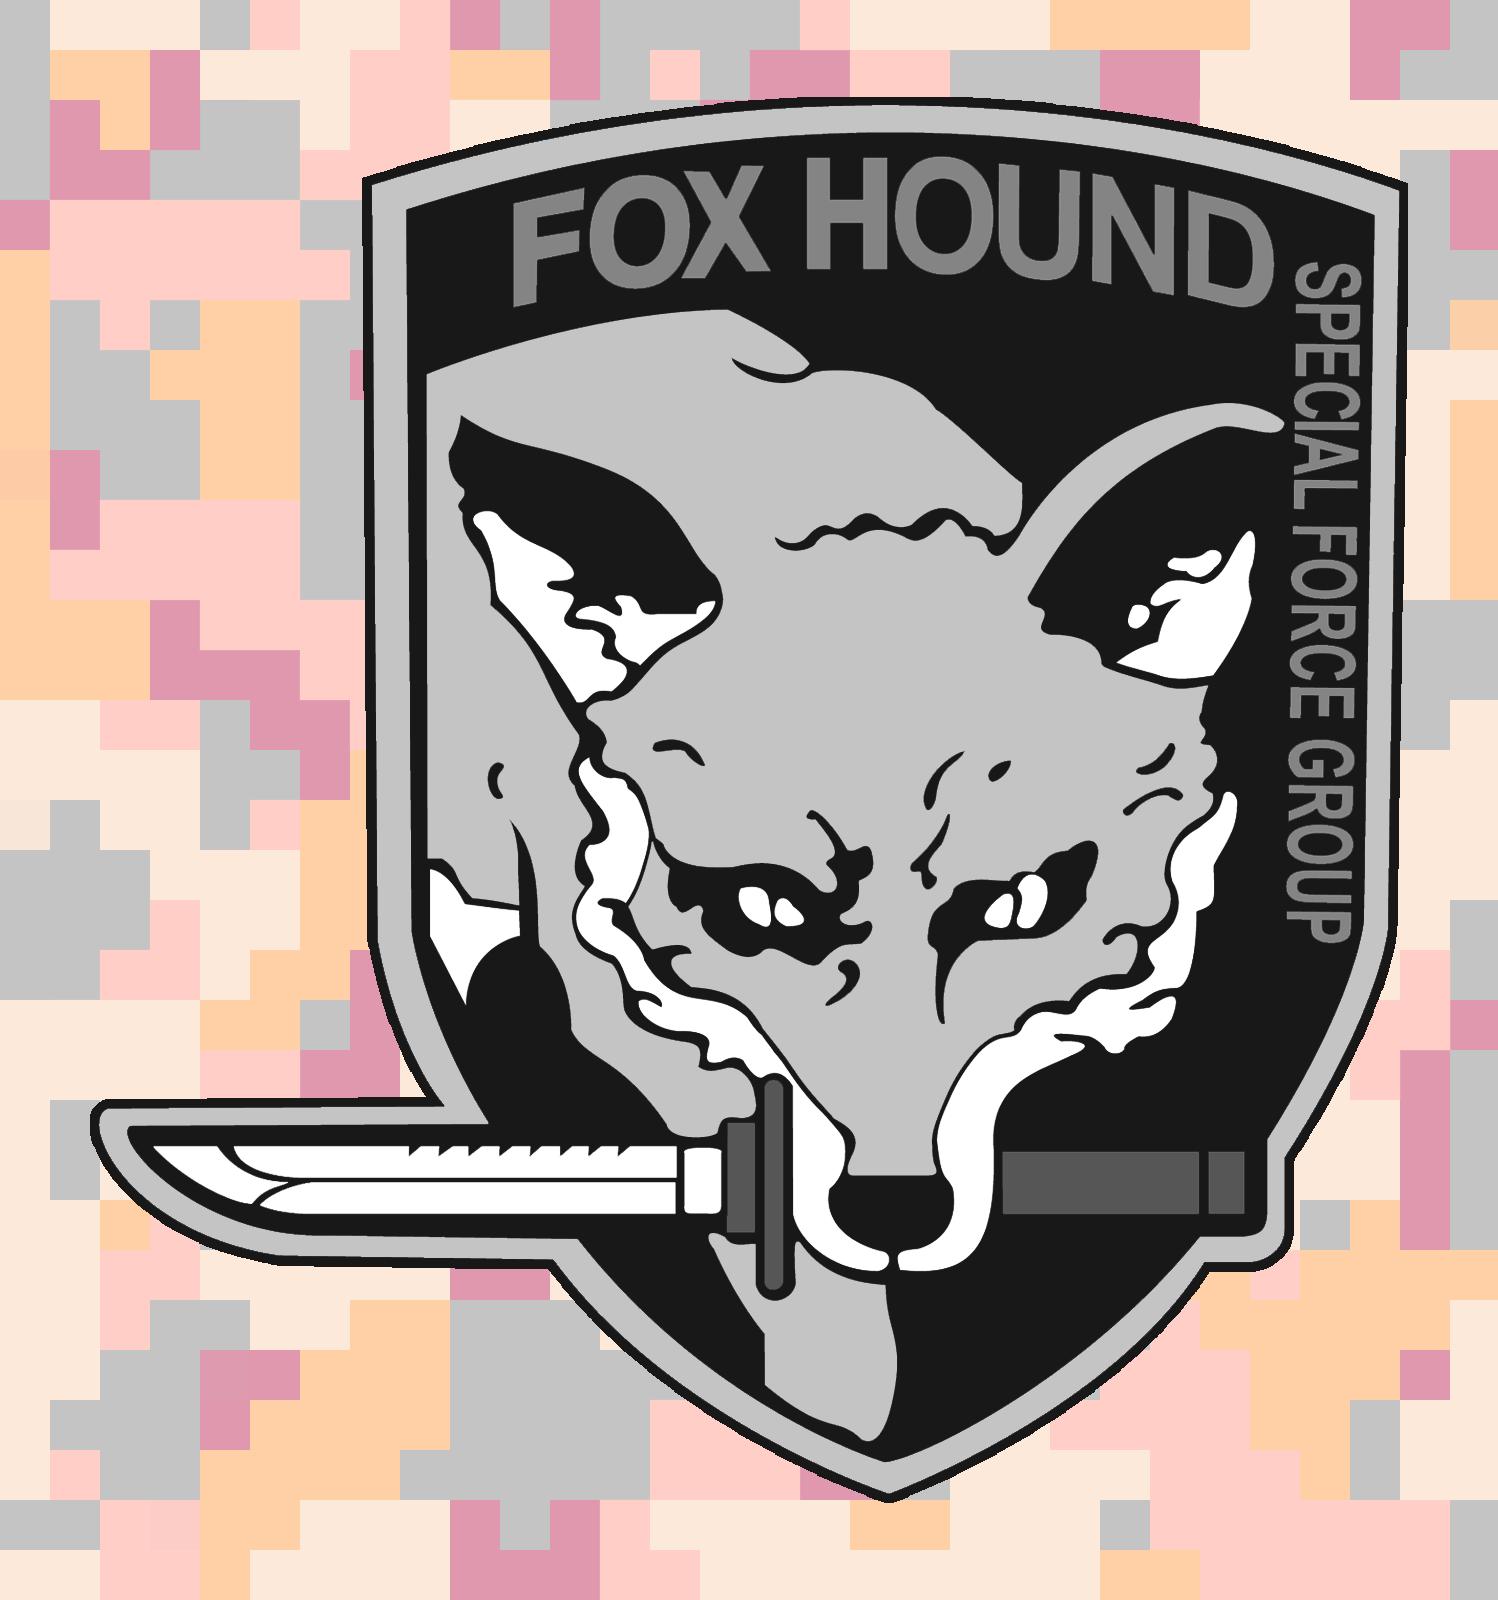 Foxhound Metal Gear Solid 1498x1600 Wallpaper Wallhaven Cc Metal Gear Solid The Fox And The Hound Metal Gear